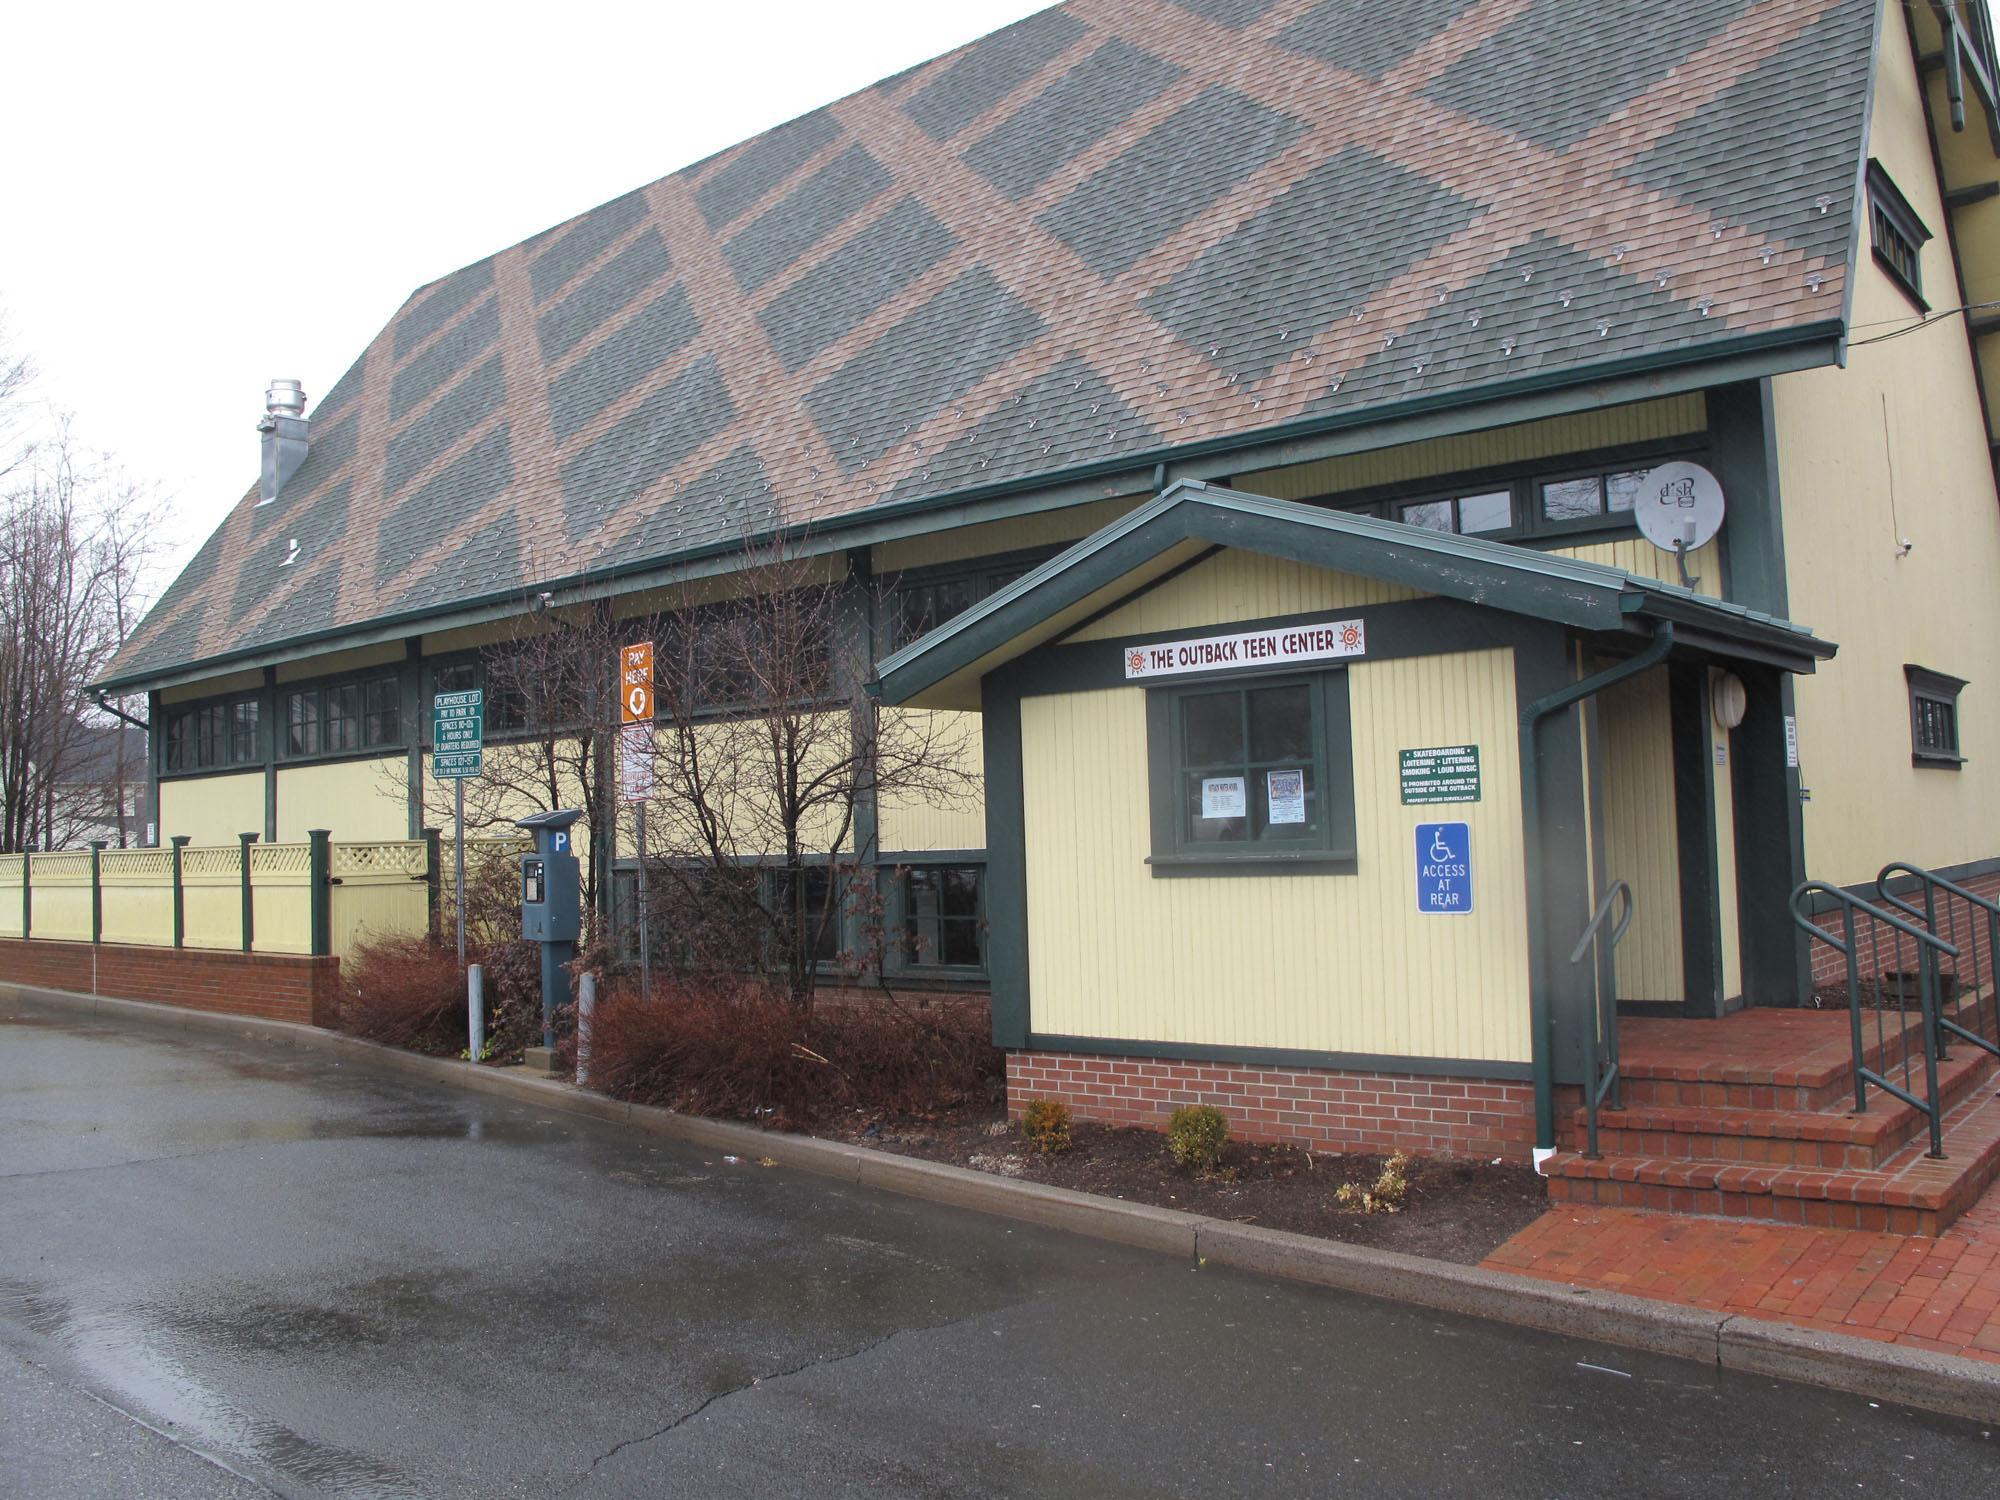 New Canaan Teen Center Inc 59